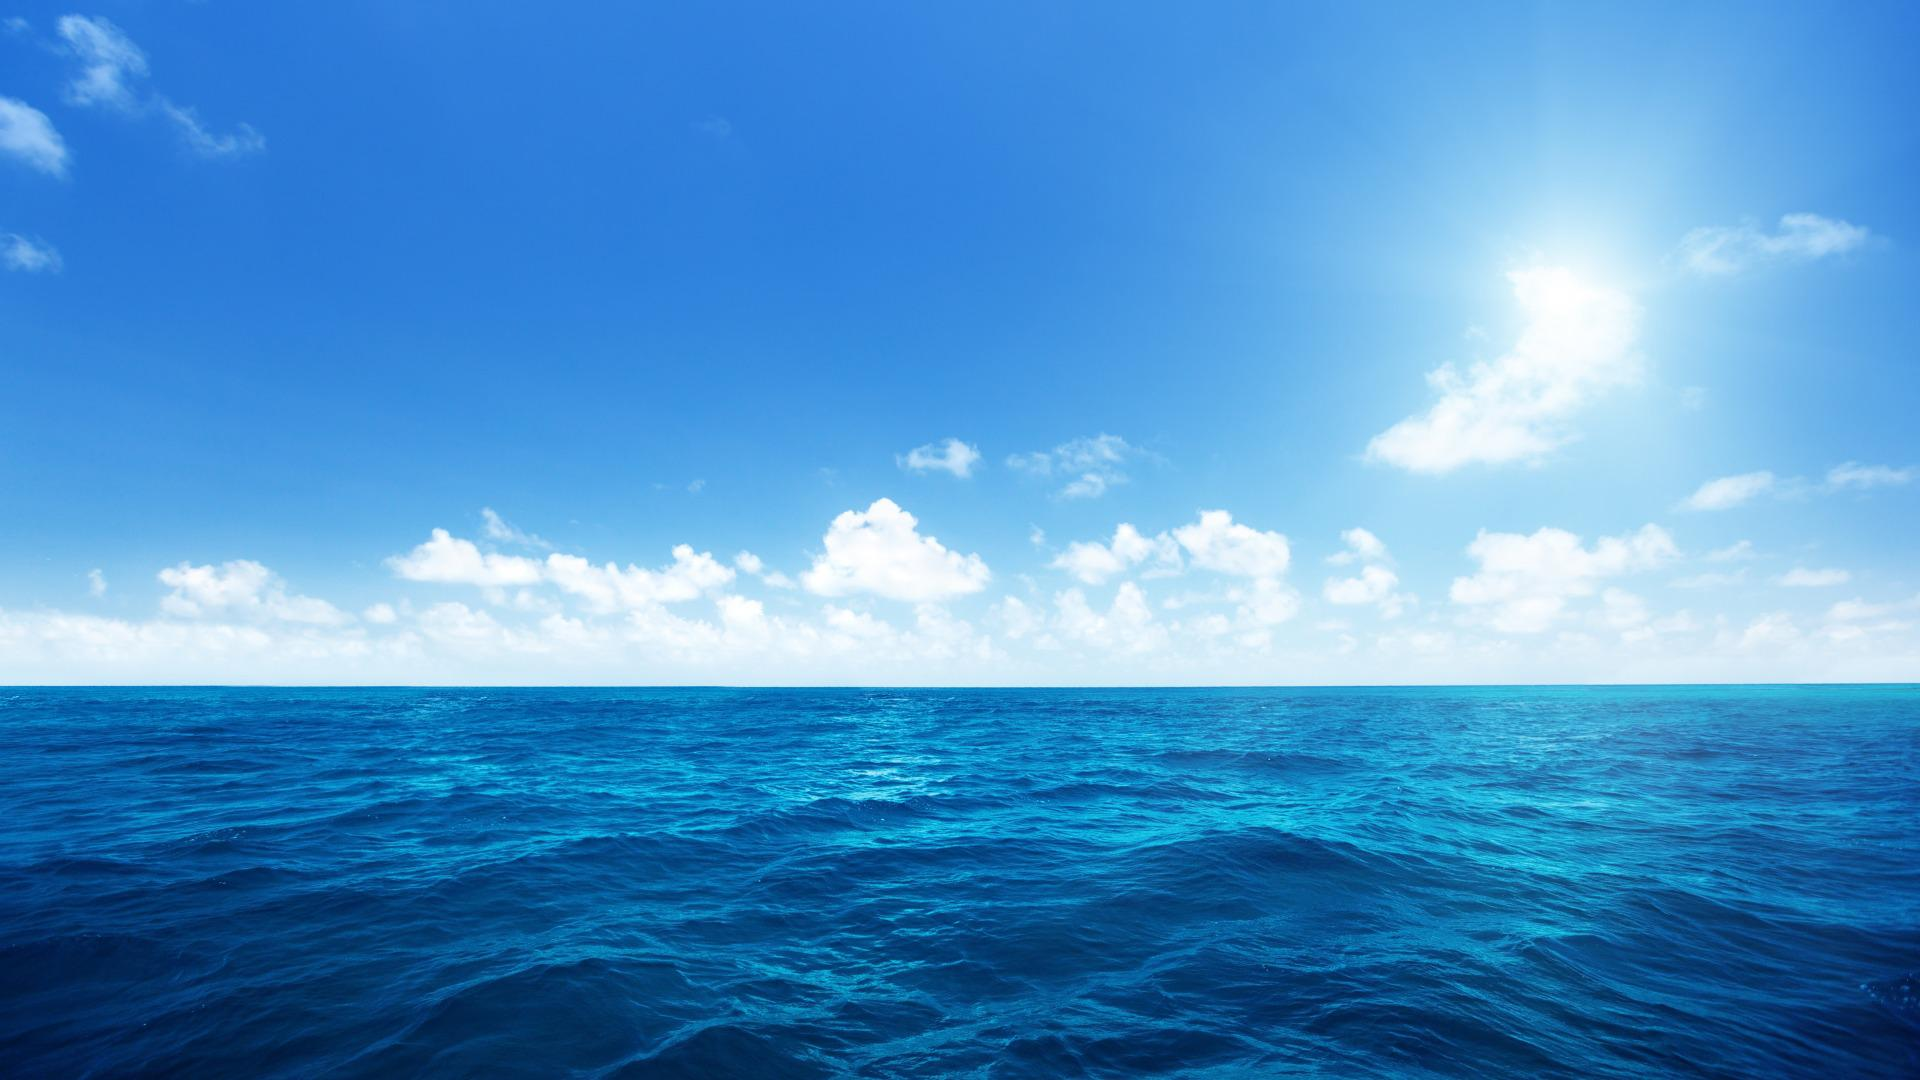 blue ماهي معاني الالوان عبر الثقافات